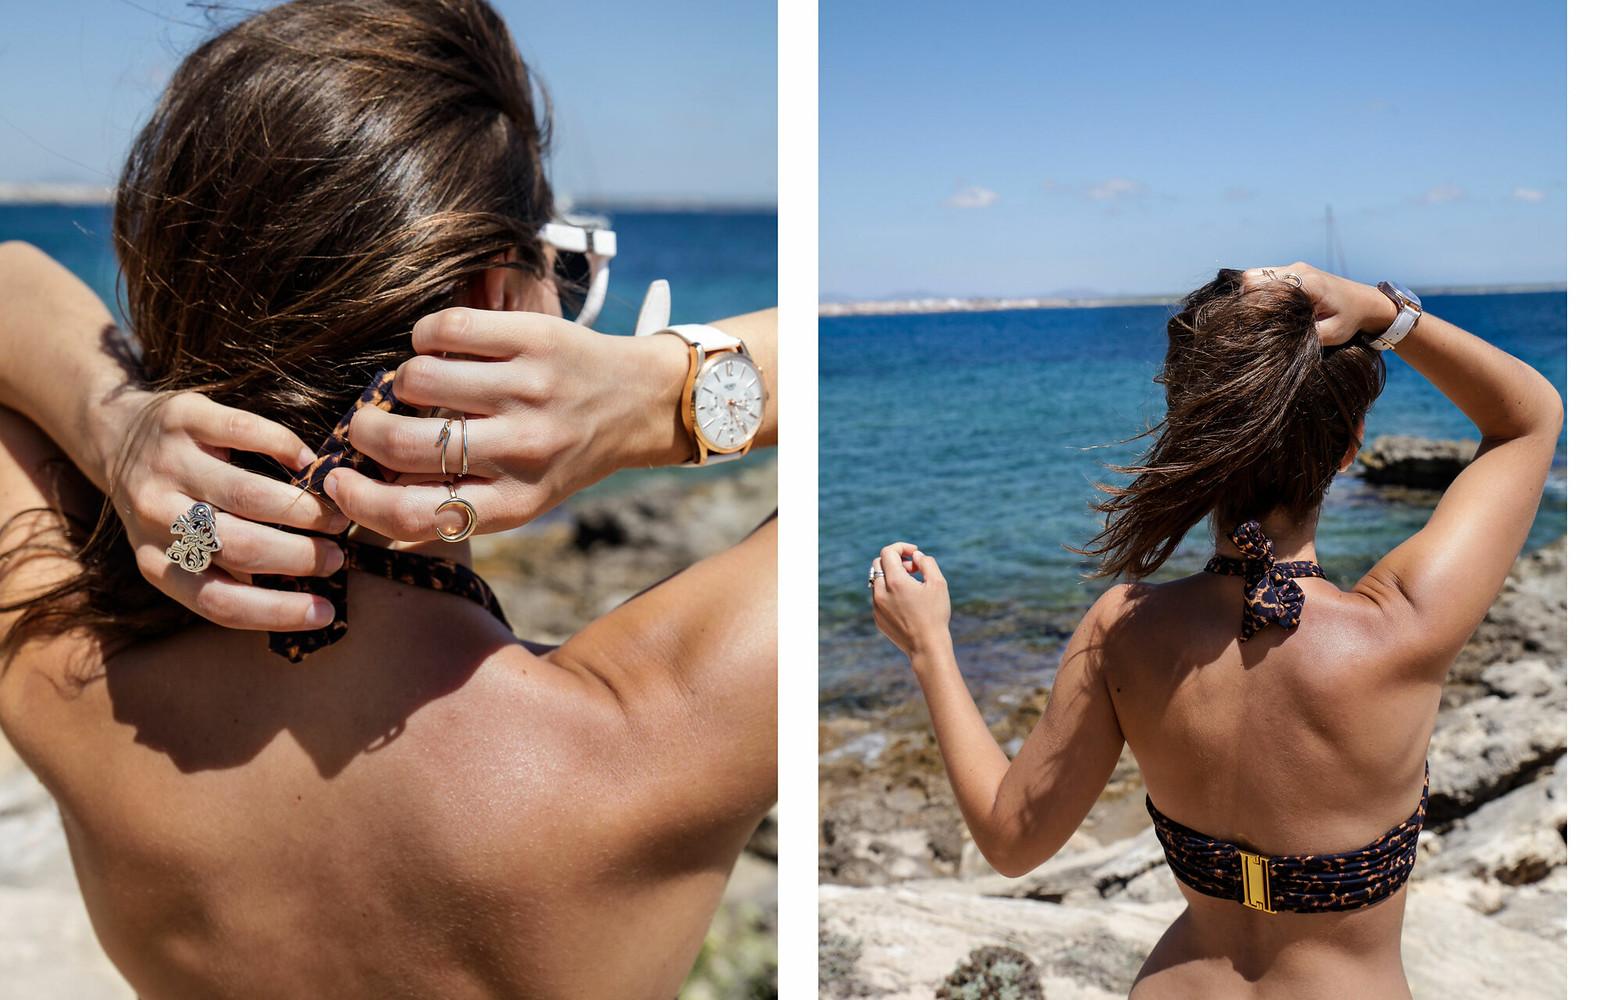 06_beachriot_leopard_swimwear_theguestgirl_summer_the_guest_girl_laura_santolaria_mediterranean_girl_mejor_bañador_2017_bikini_sexy_laura